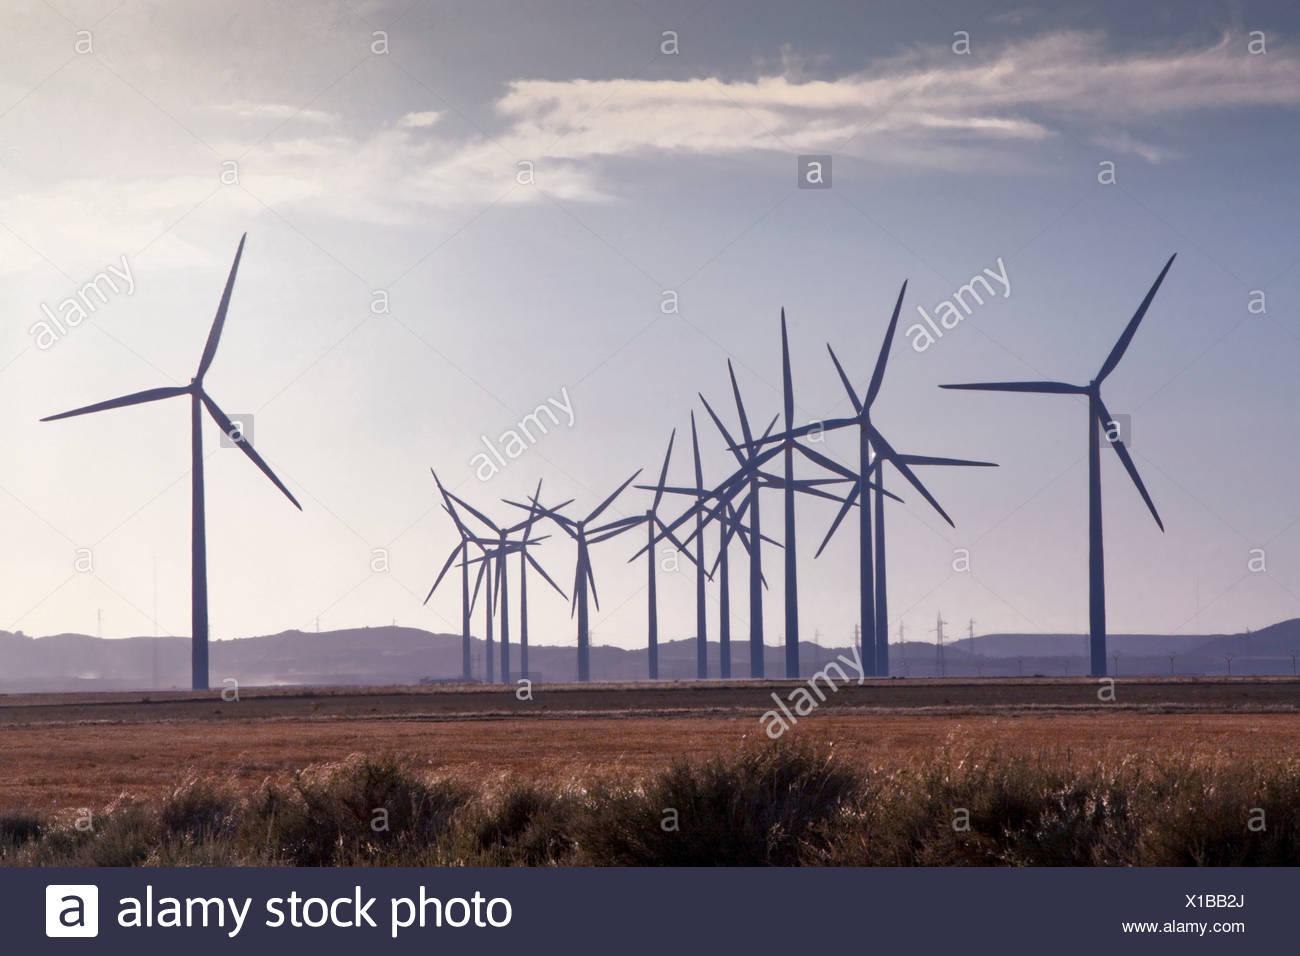 Spain, Europe, Aragon, wind farm, wind energy, wind turbine, energy, with Belchite, ecological - Stock Image